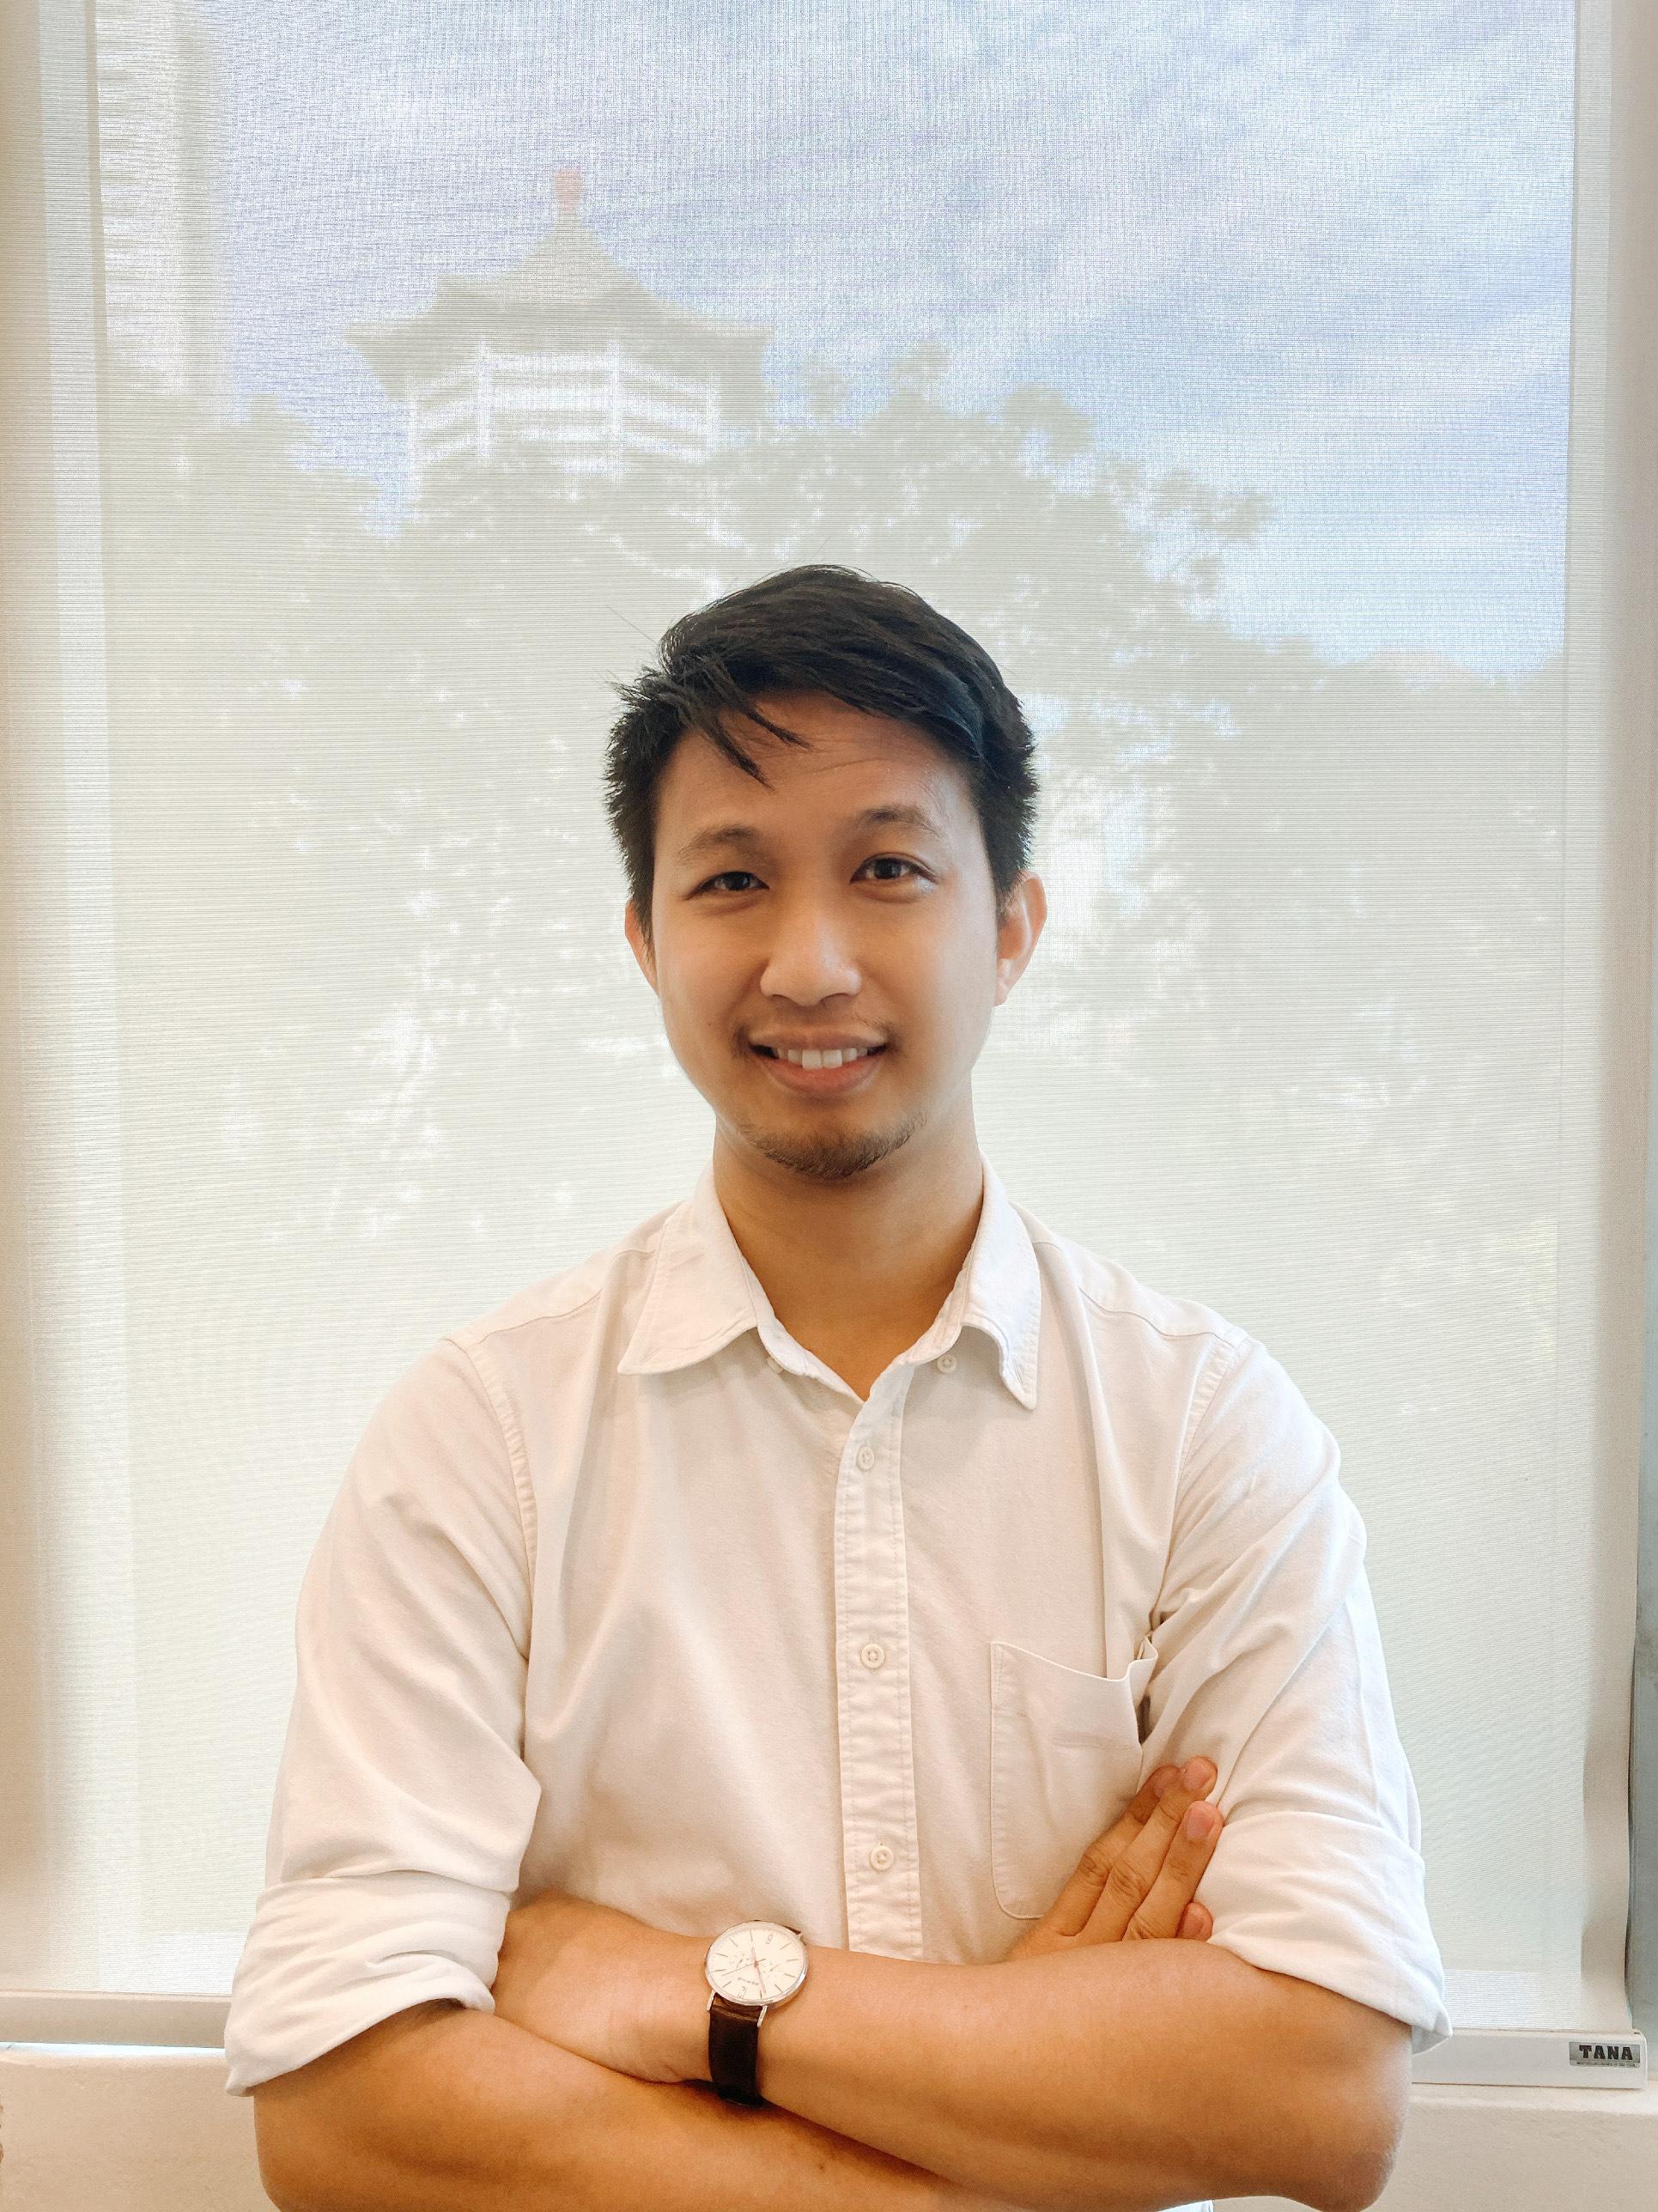 David Ow, Senior Physiotherapist